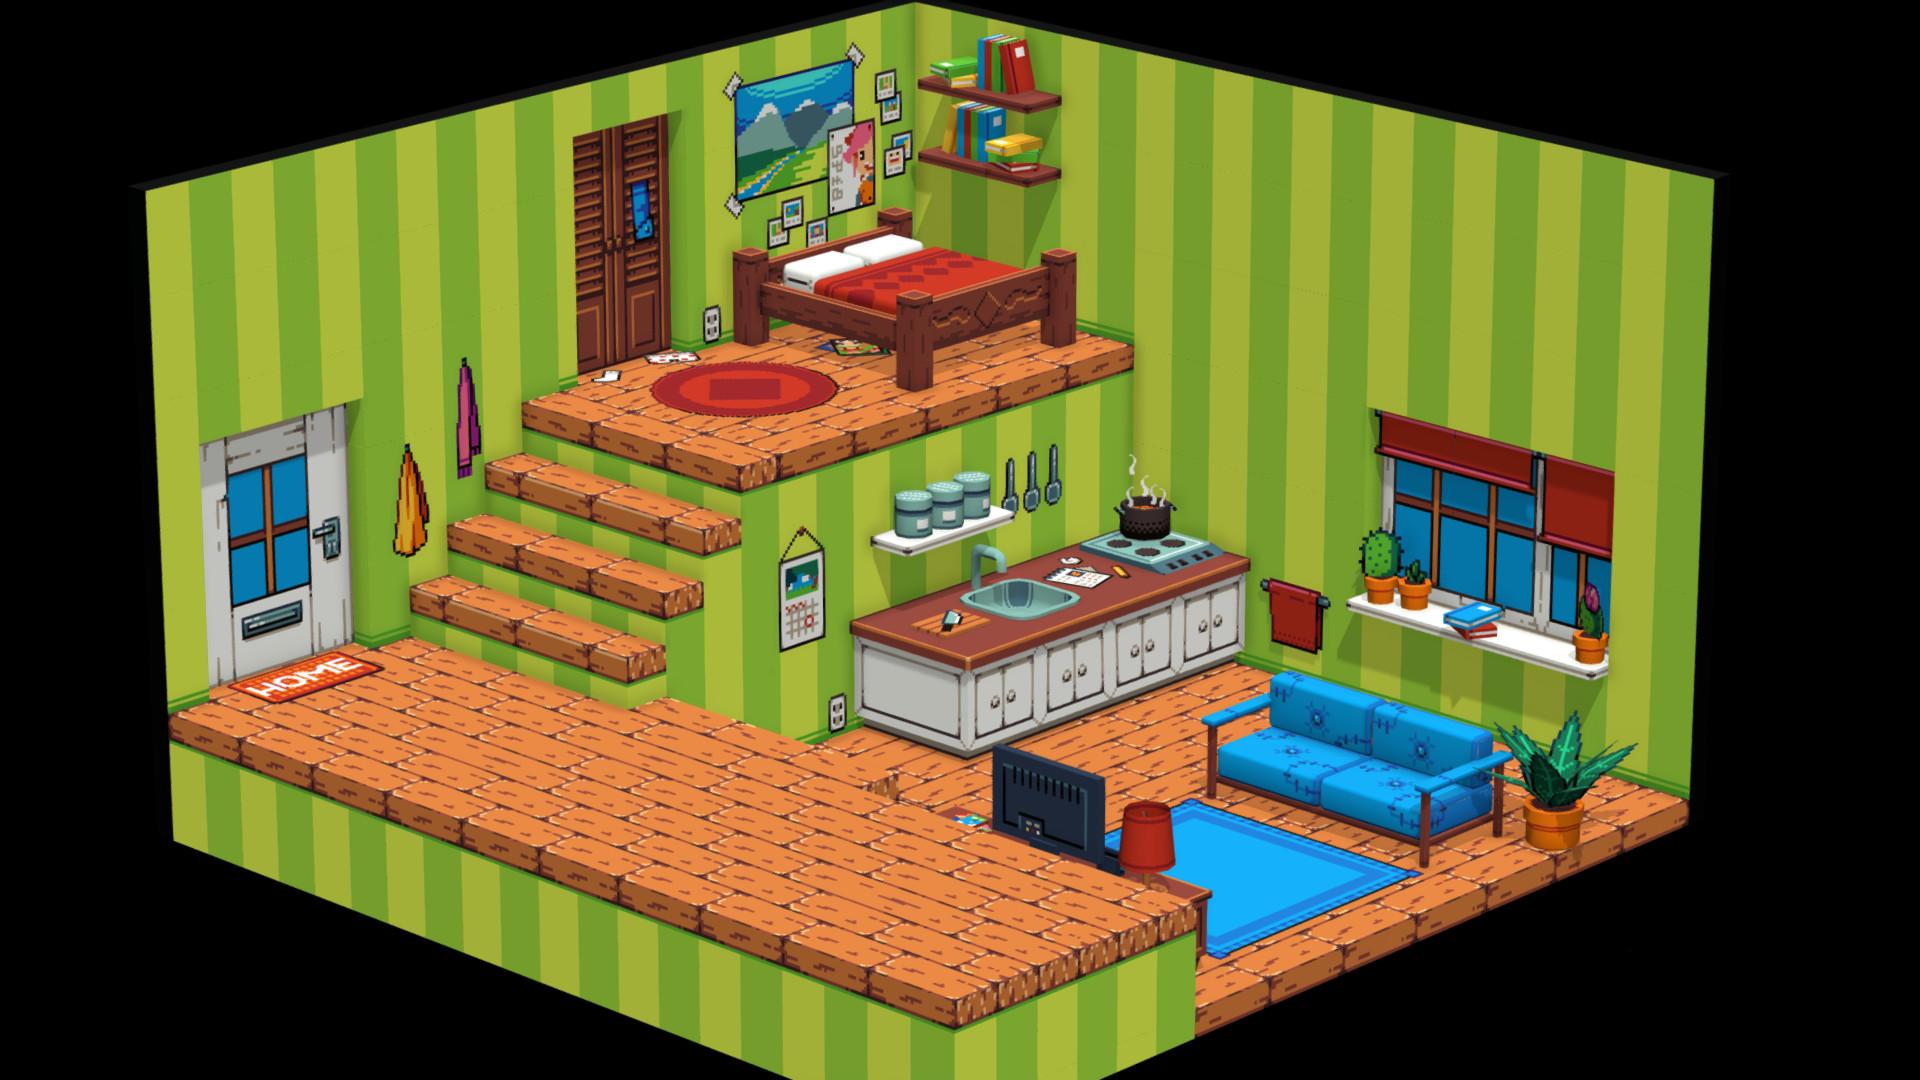 artstation 3d pixel art isometric room rens pitman